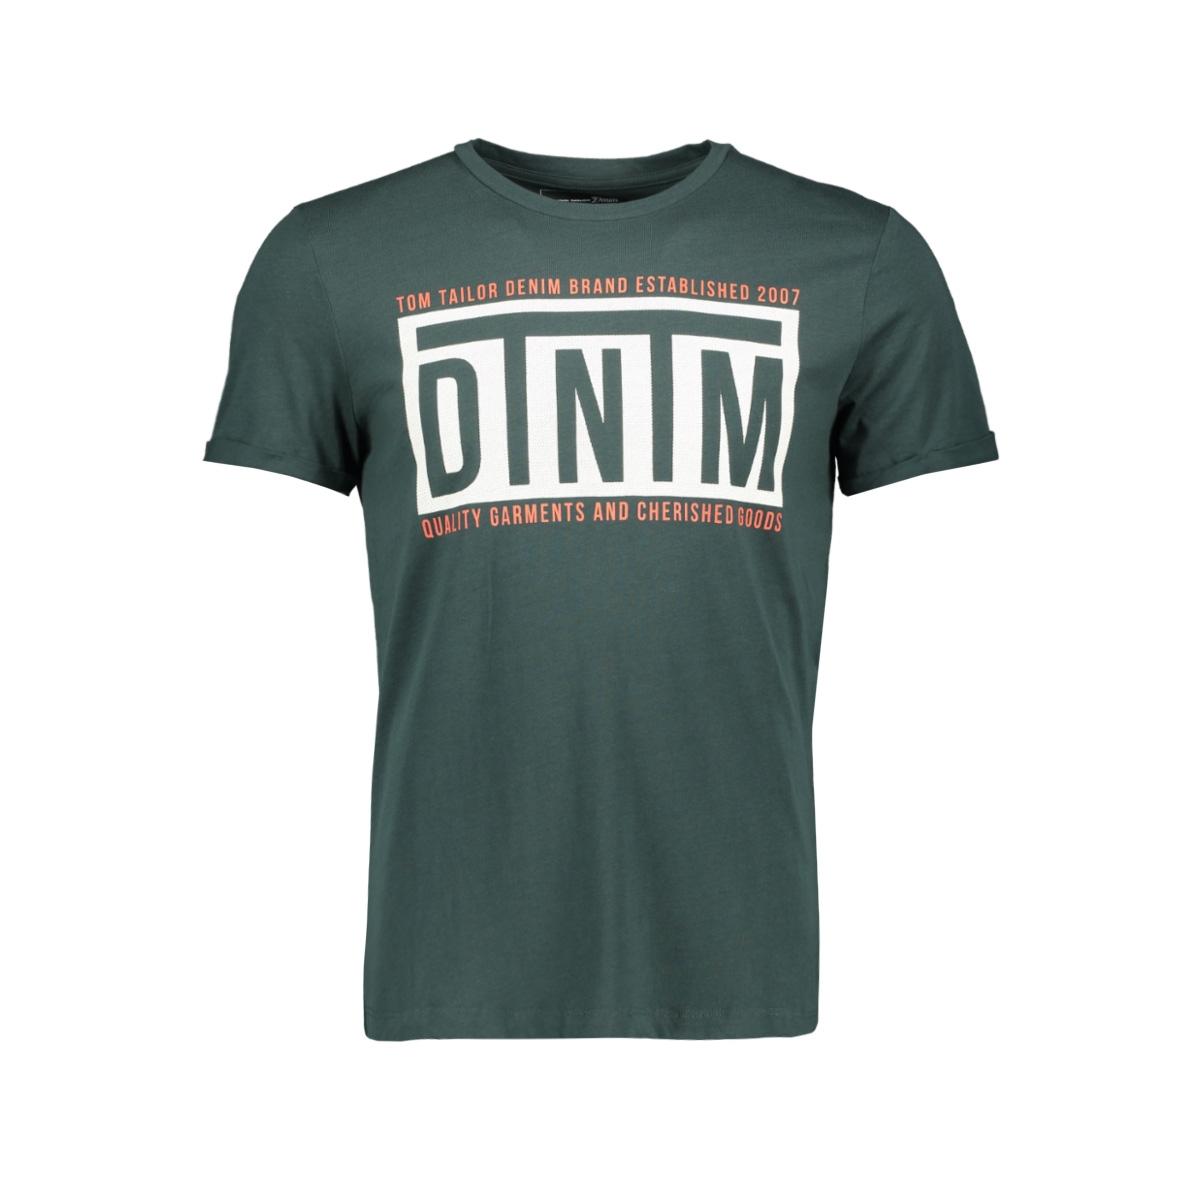 t shirt met tekst 1011975xx12 tom tailor t-shirt 10362